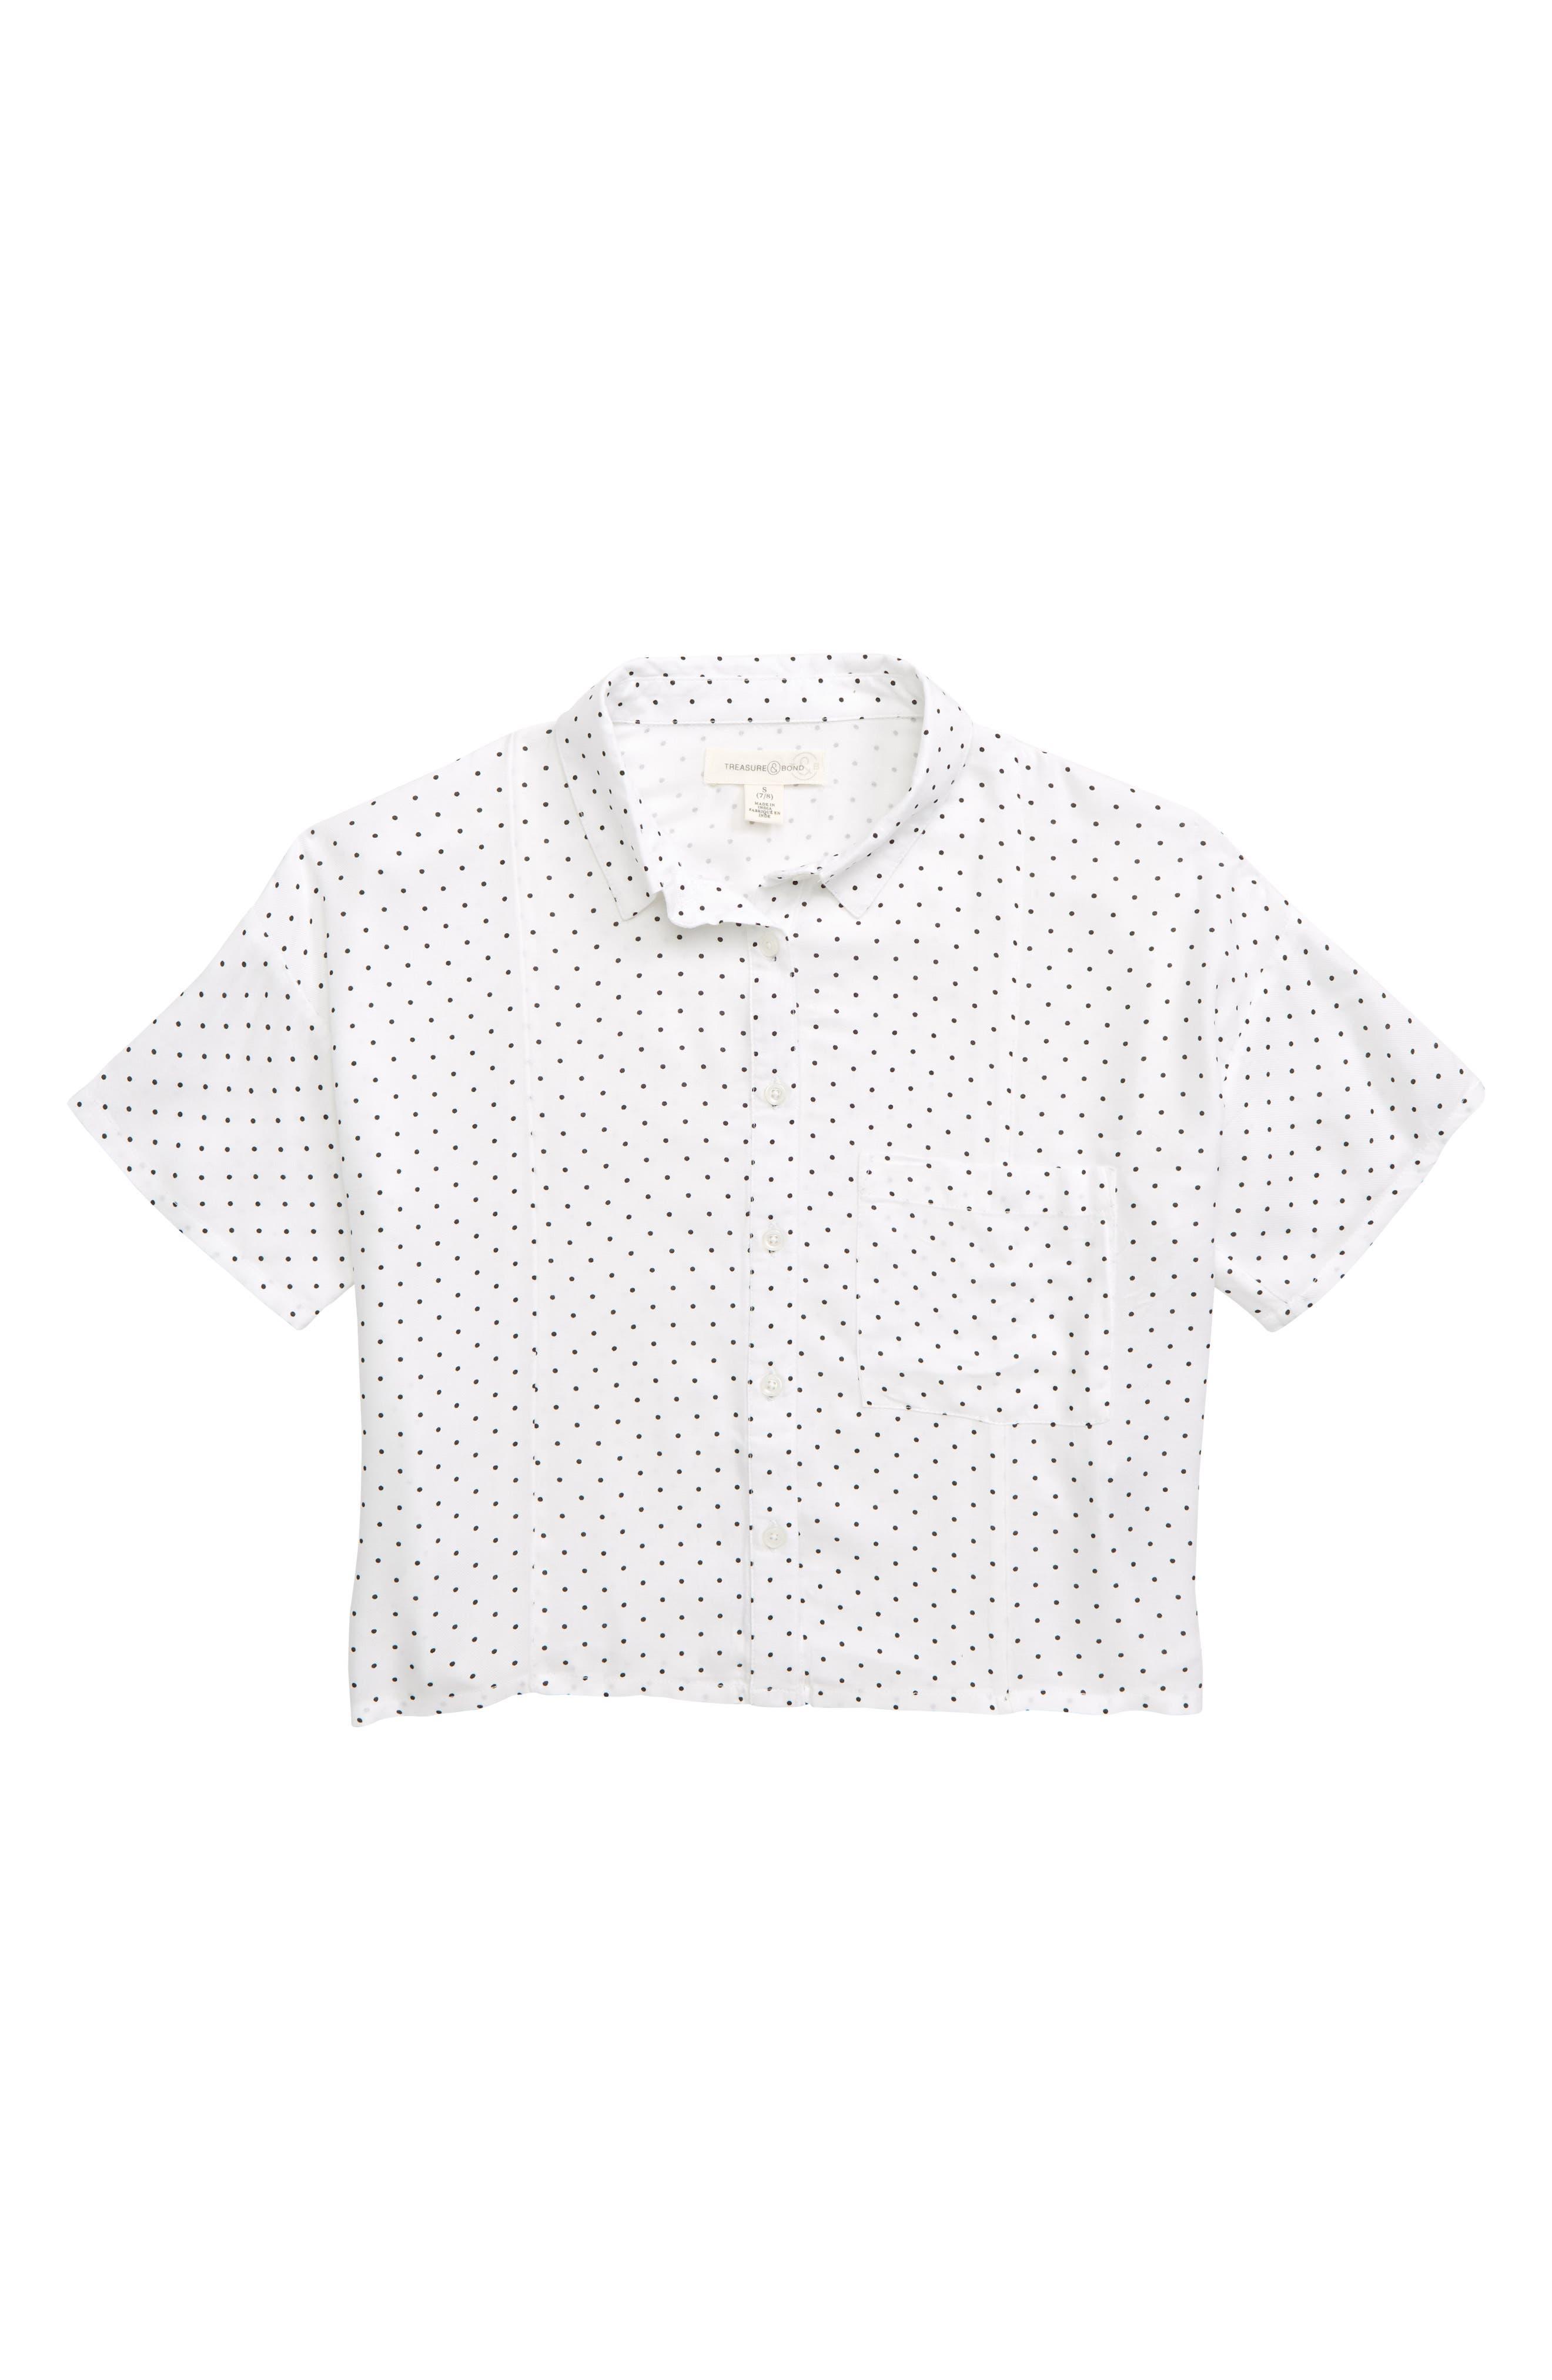 TREASURE & BOND, Boxy Polka Dot Shirt, Main thumbnail 1, color, WHITE- BLACK DOT